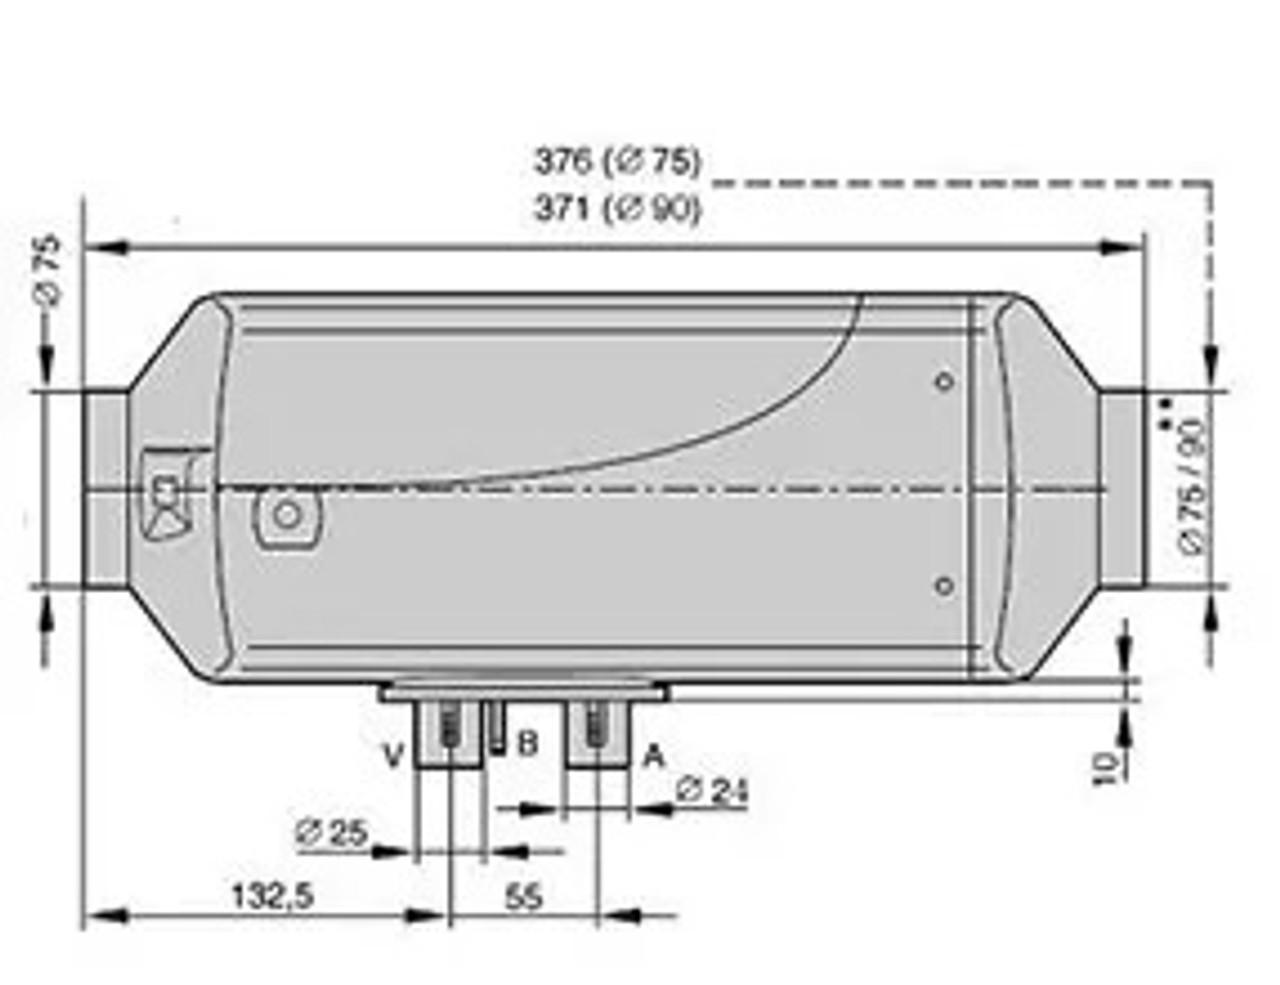 Eberspacher Airtonic D4 Motorhome Horsebox Diesel Heater DIMS length